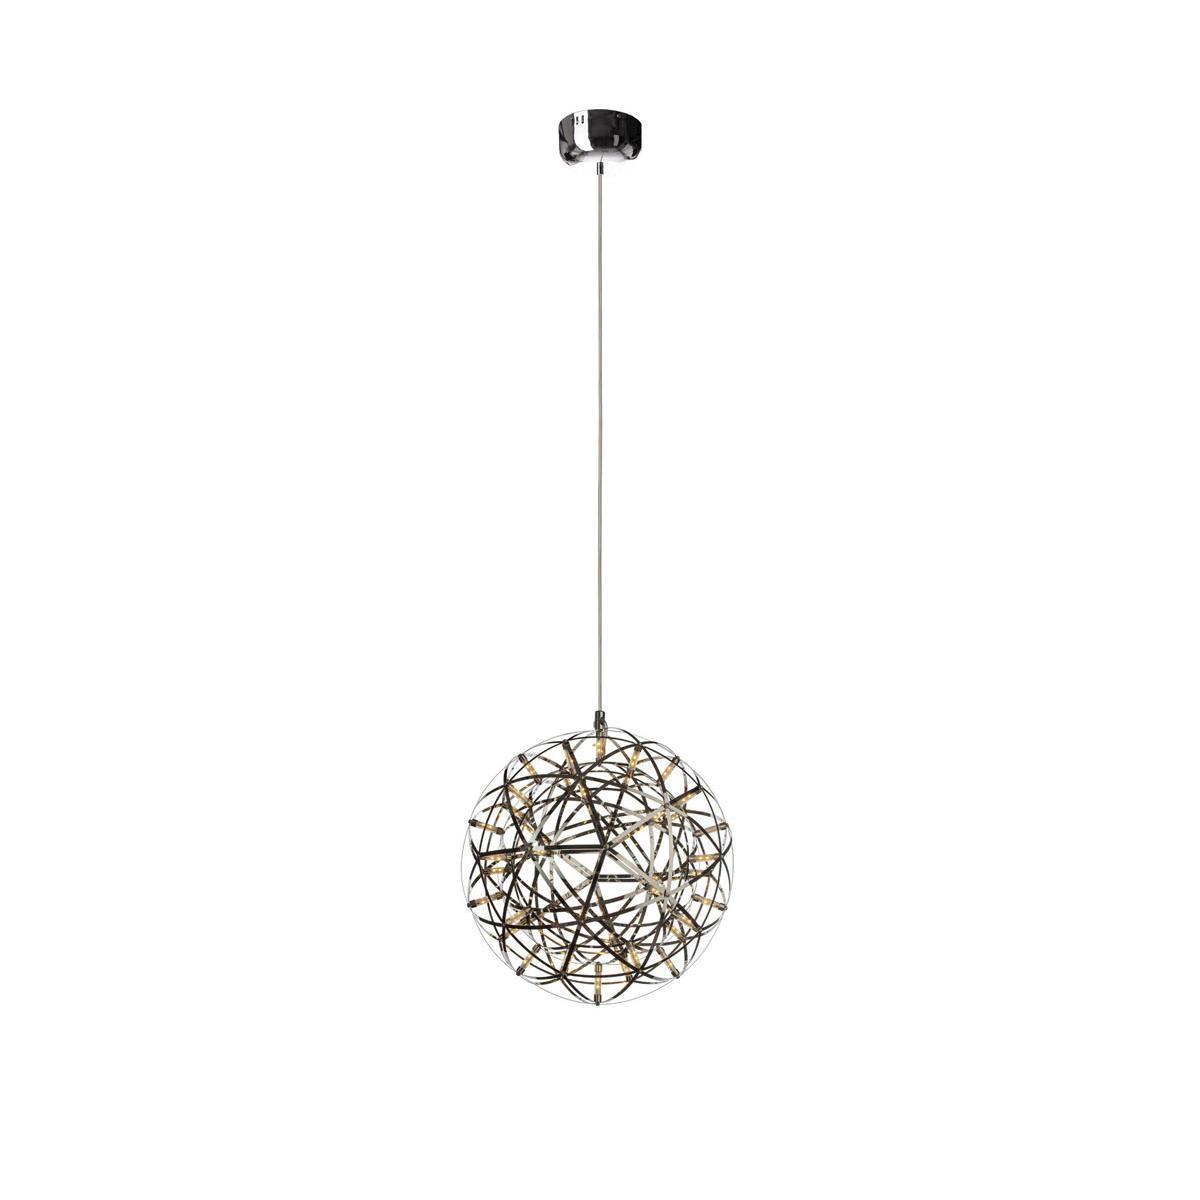 Подвесная светодиодная люстра Loft It Moooi Raimond 1898/4, LED 16,8W, хром, металл - фото 2